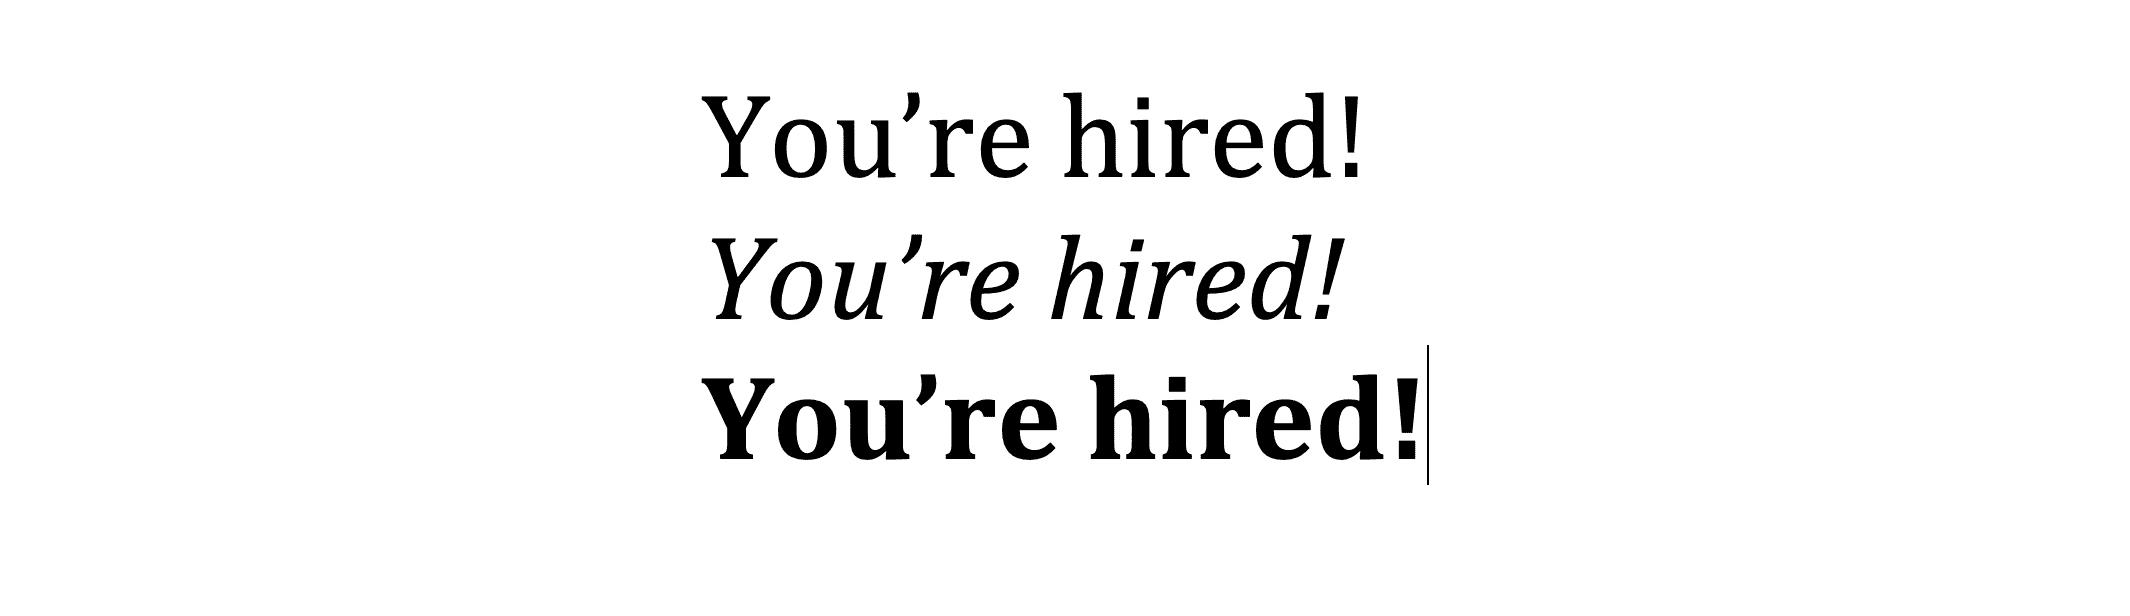 Cambria font example text.